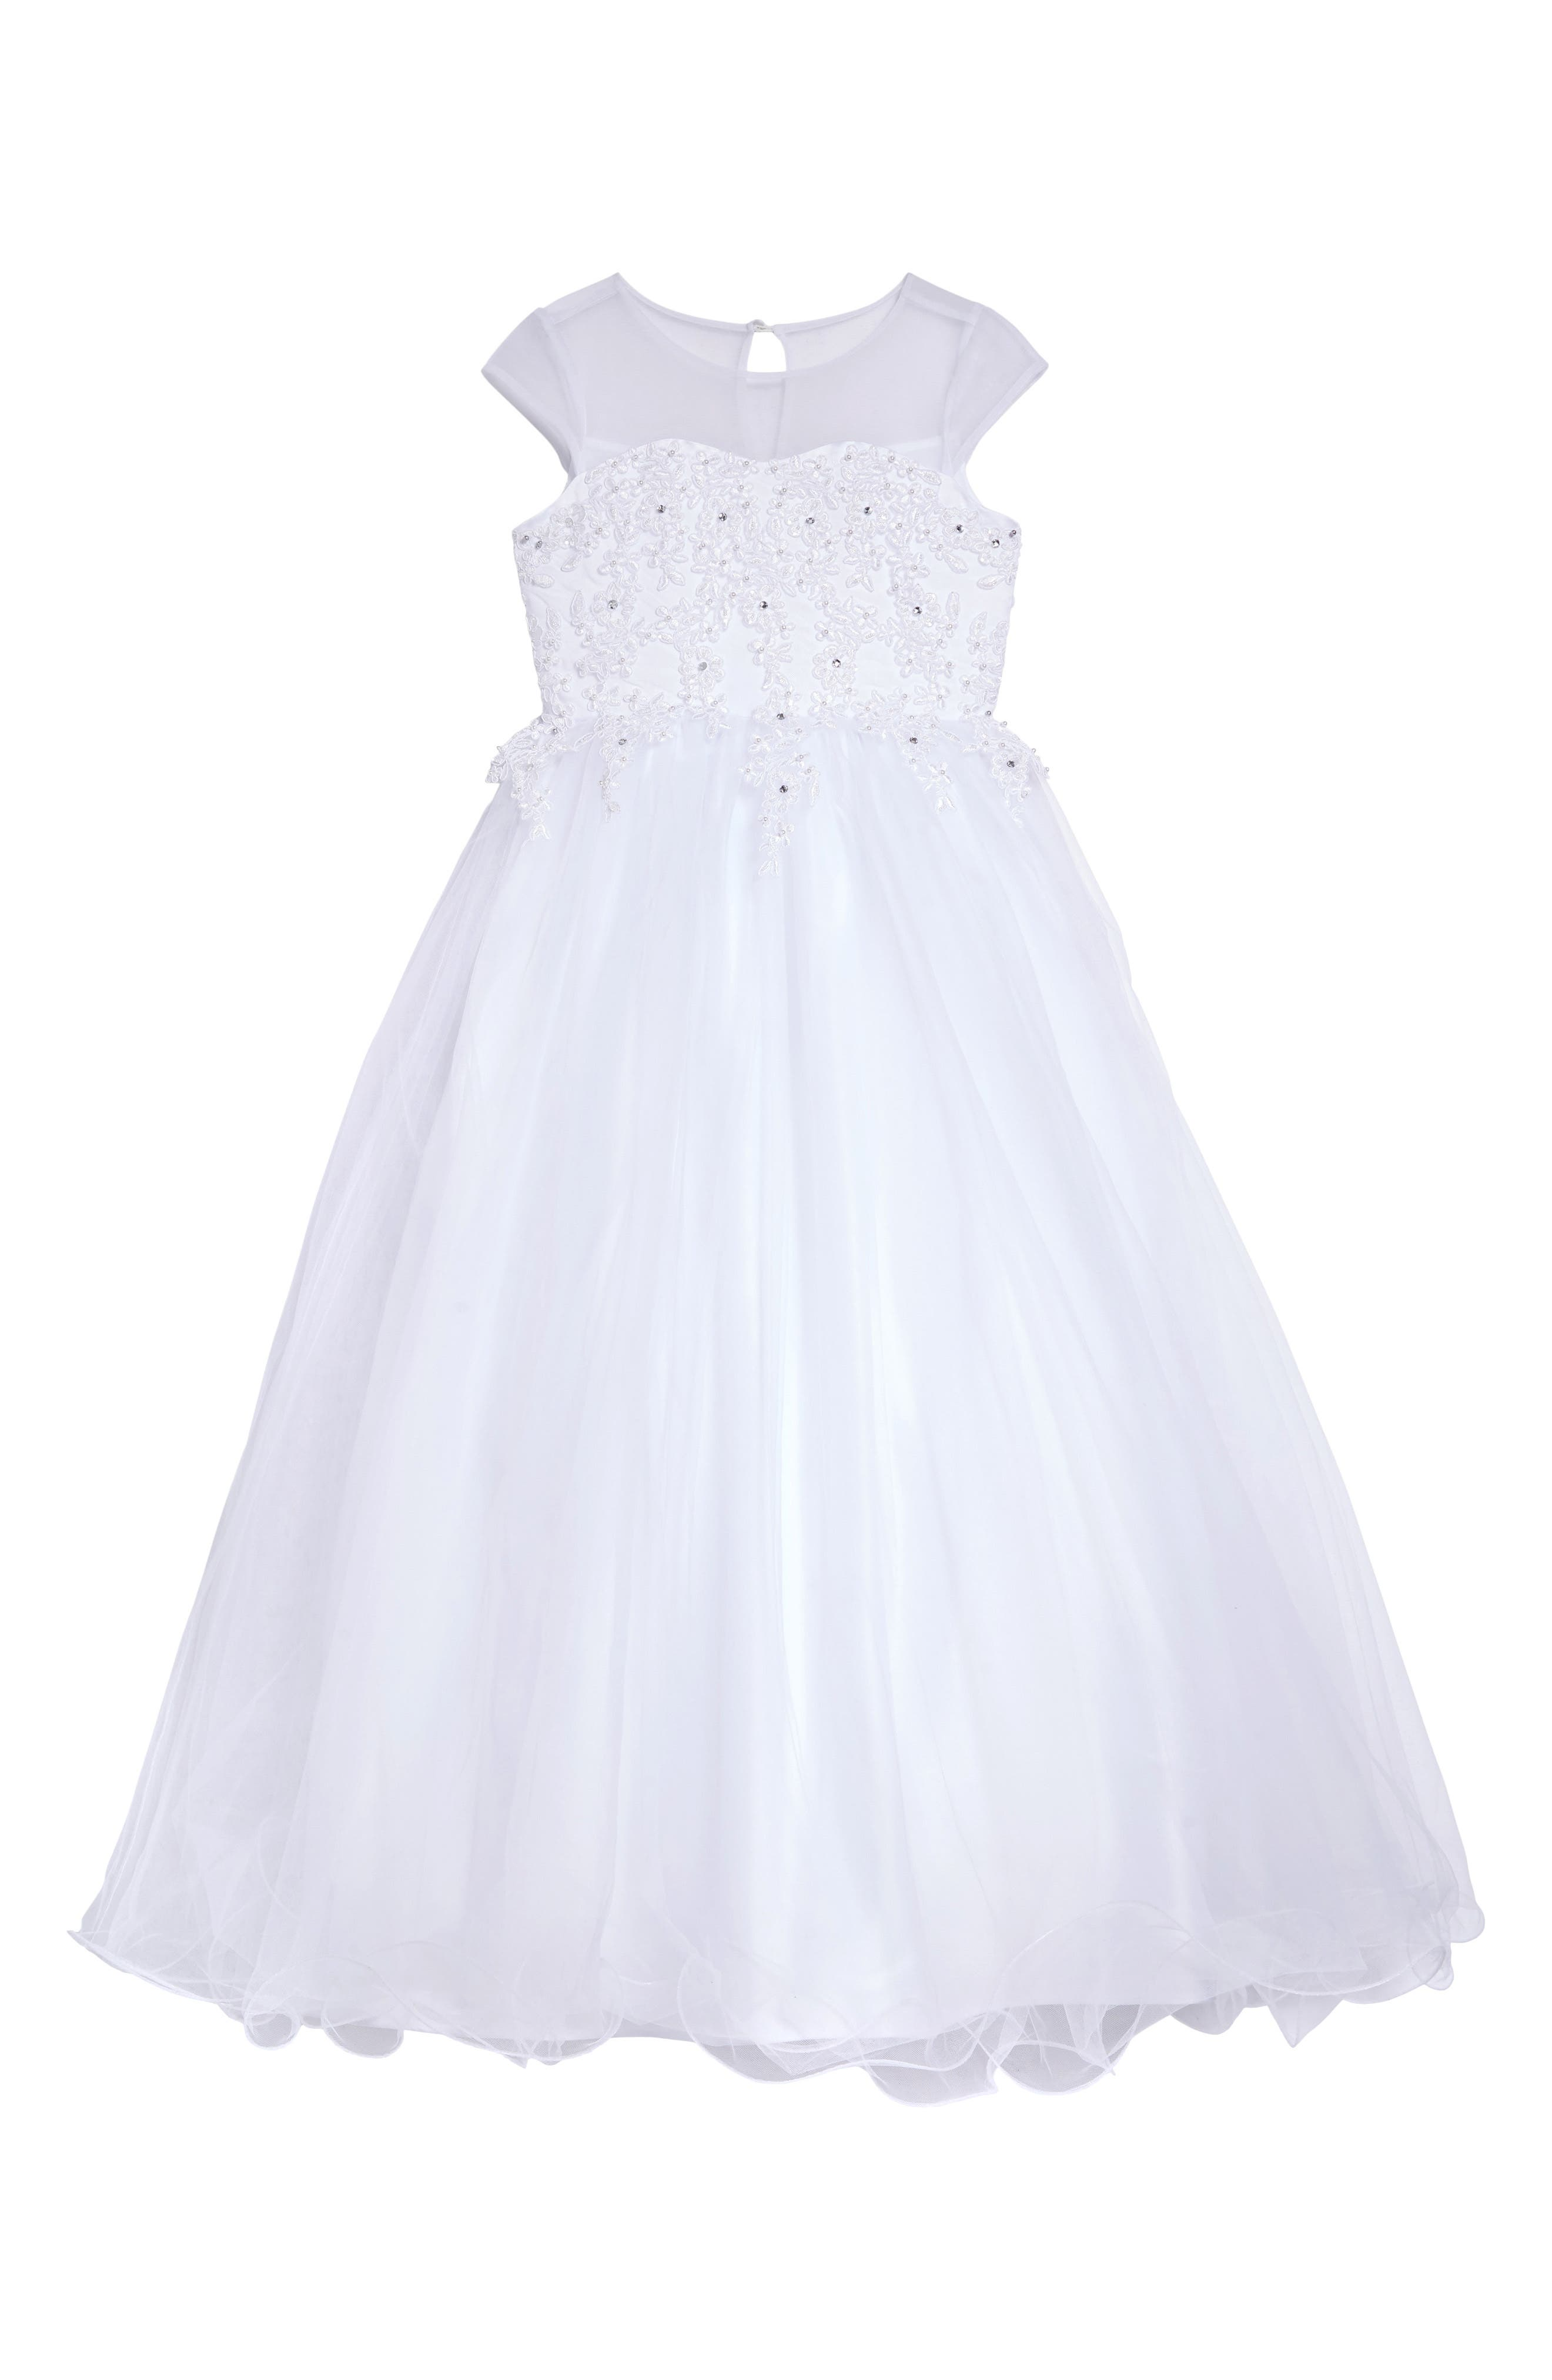 Girls' First Communion Dresses